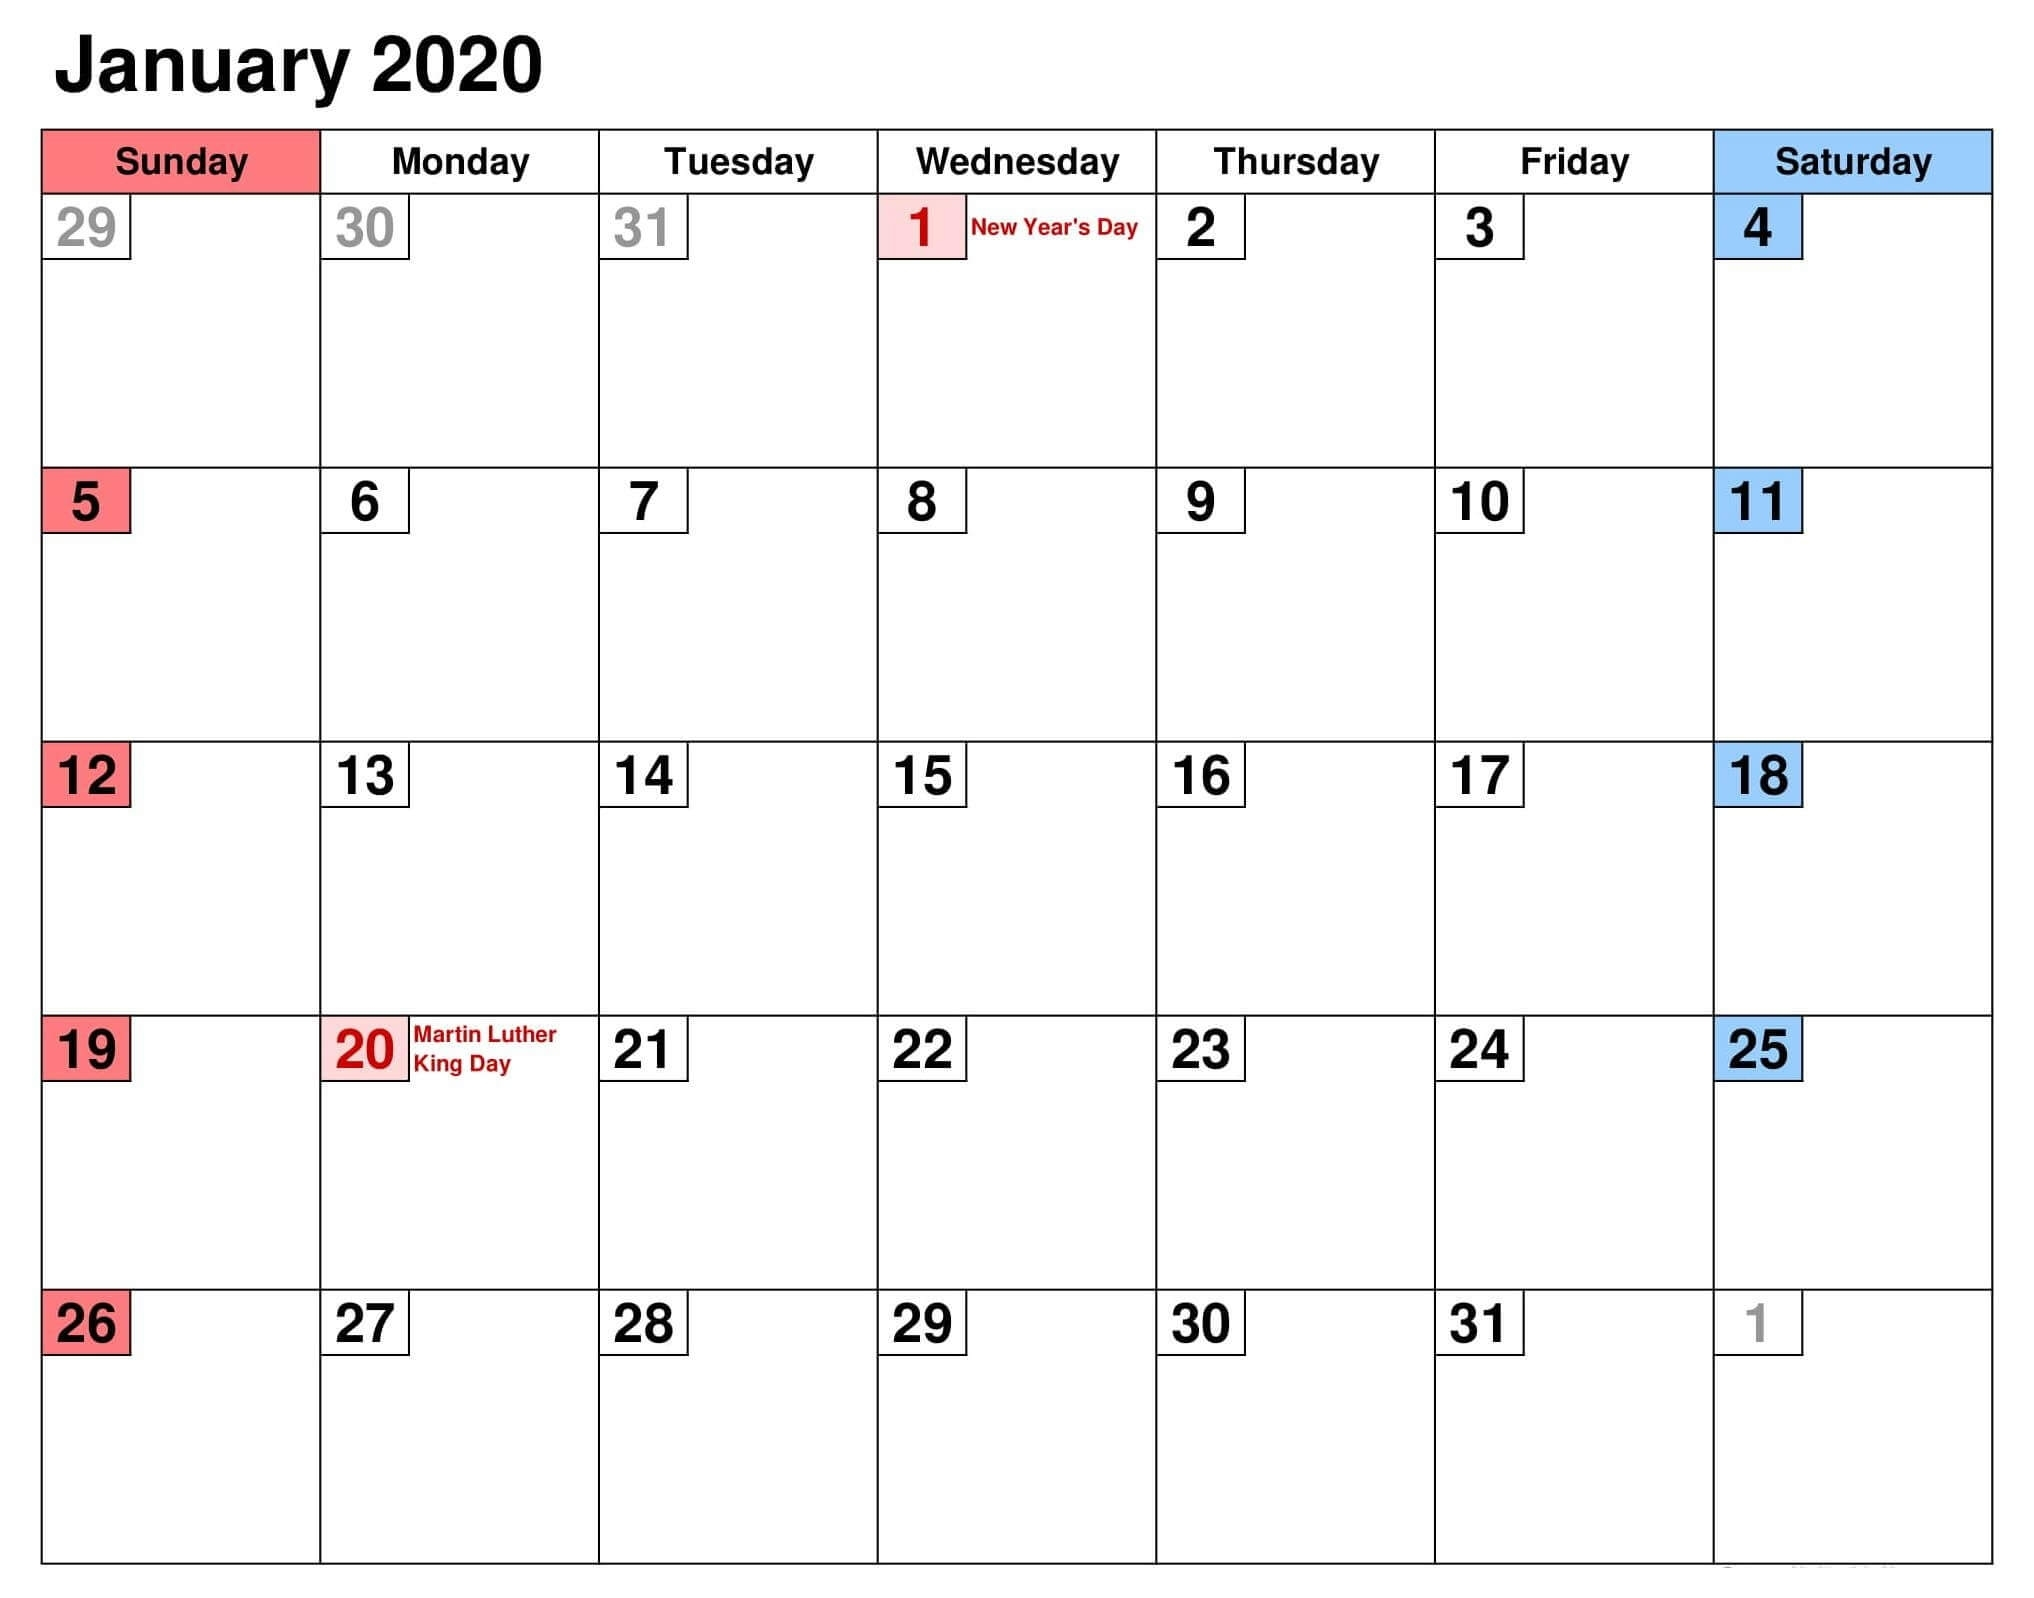 January 2020 Calendar Canada Bank Holidays | Free Printable inside Free Printable 2020 Canadian Calendar Motivational